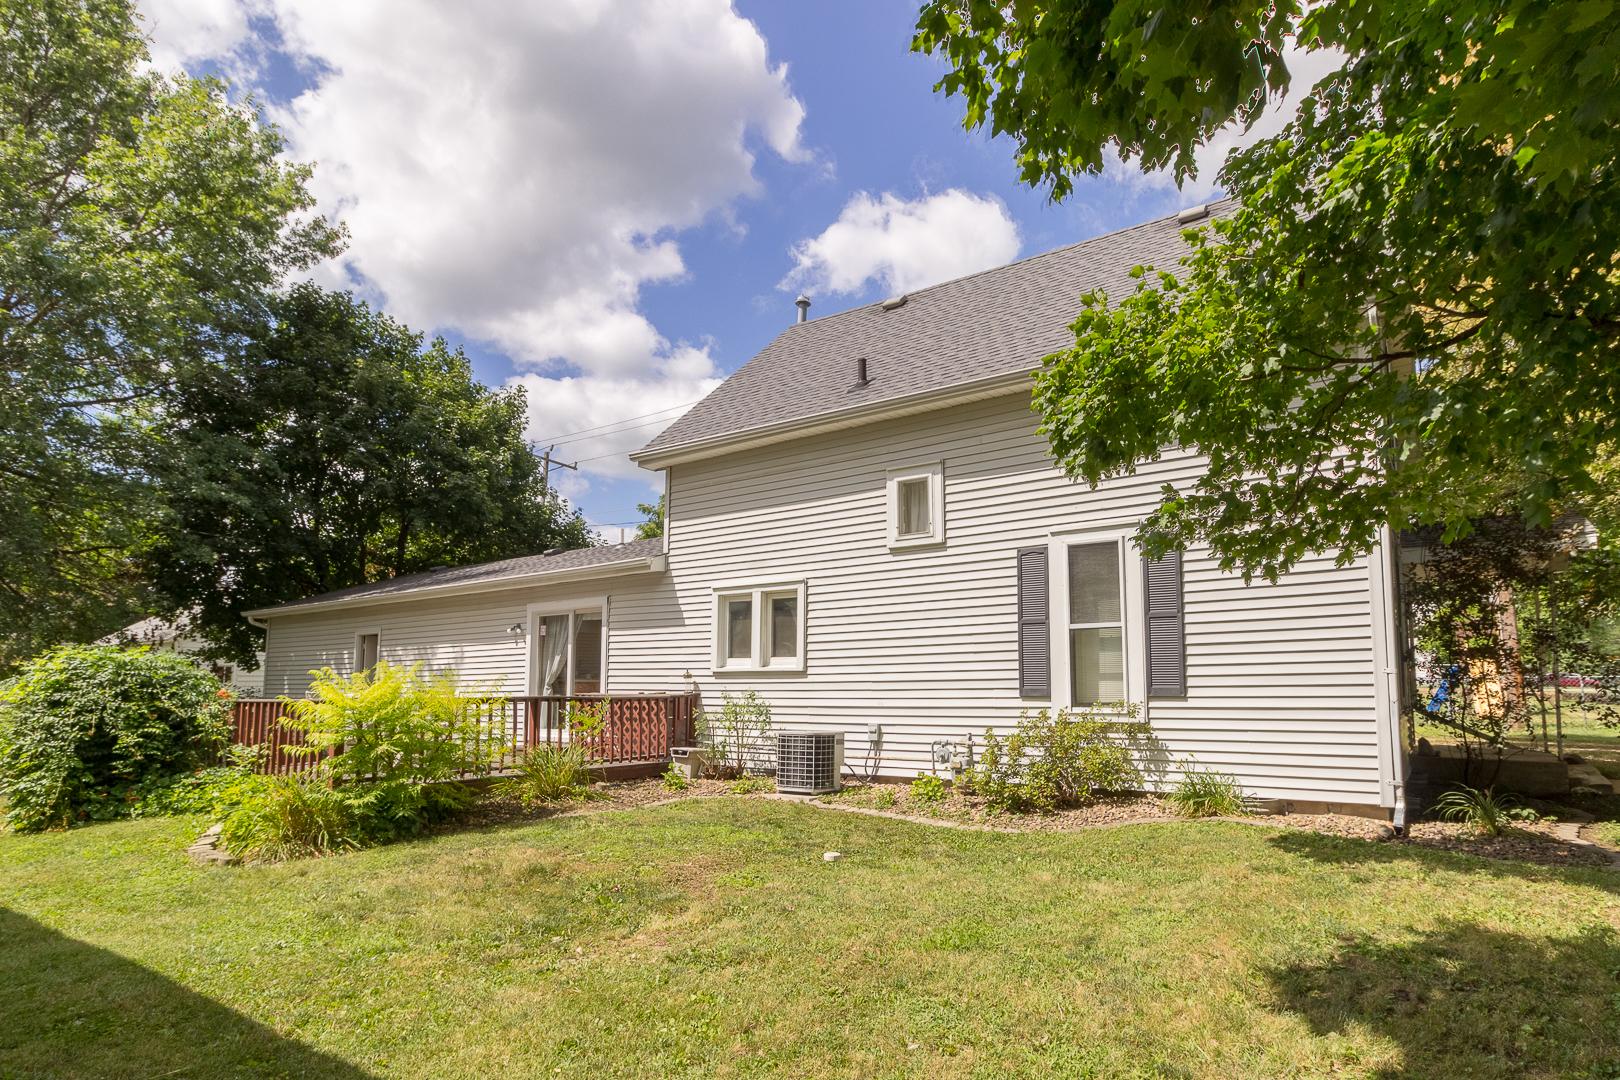 104 W North, Lexington, Illinois, 61753